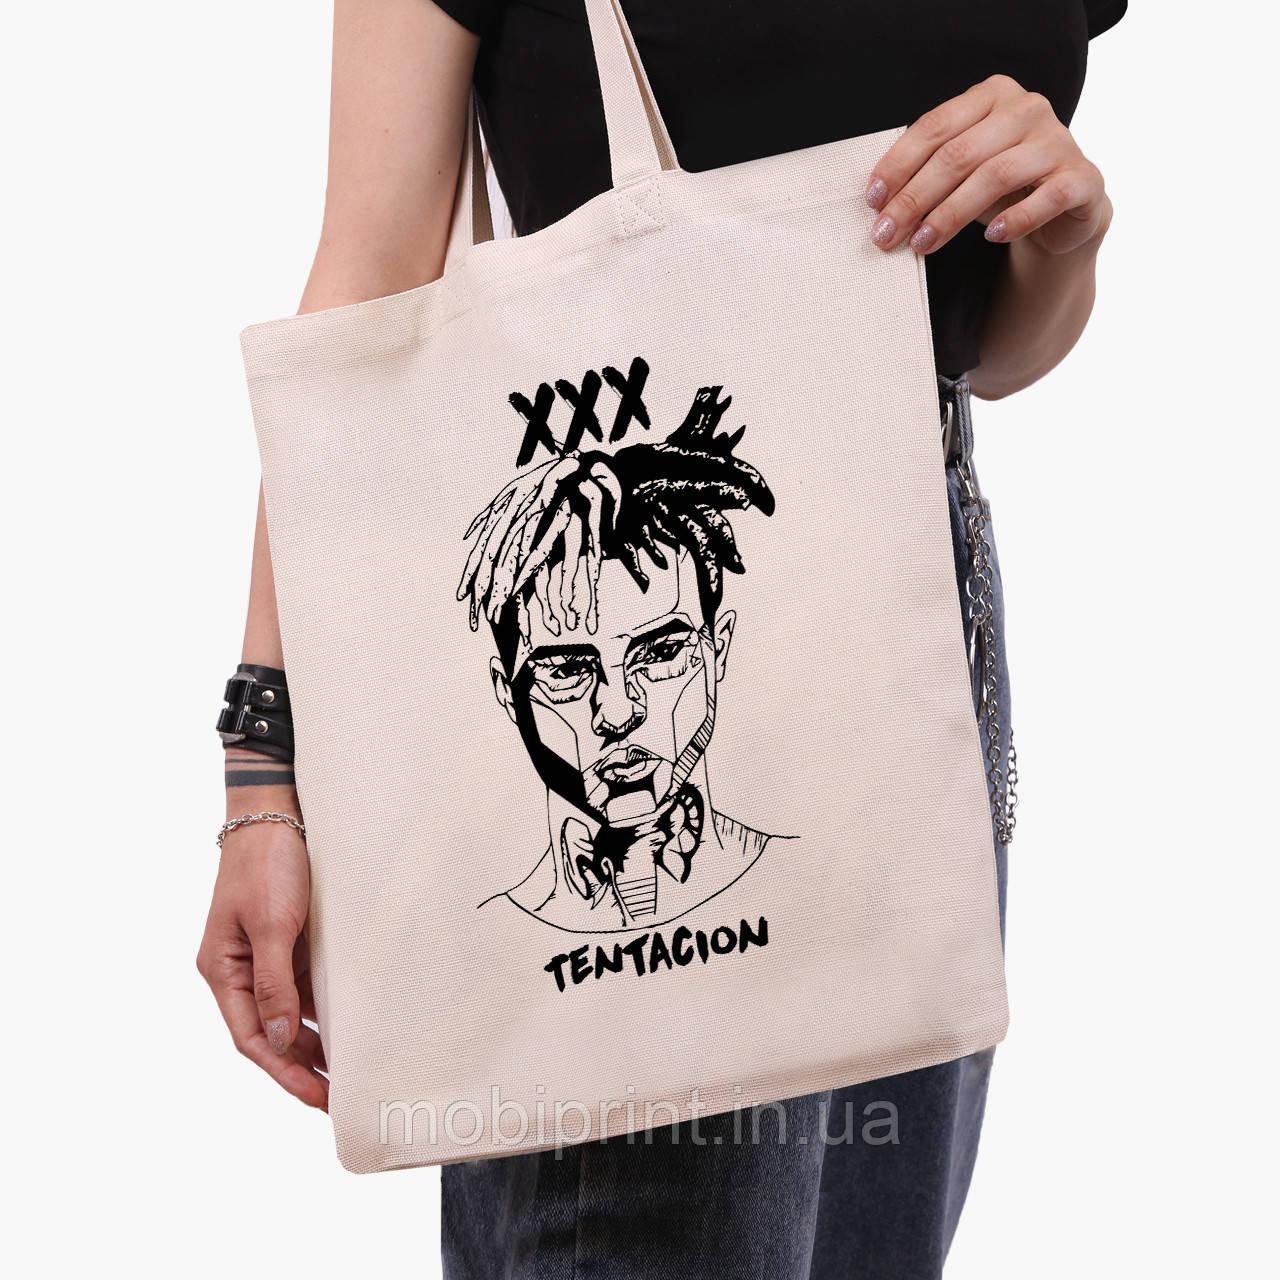 Эко сумка шоппер Экс-экс-экс Тентасьон (XXXTentacion) (9227-2637)  41*35 см